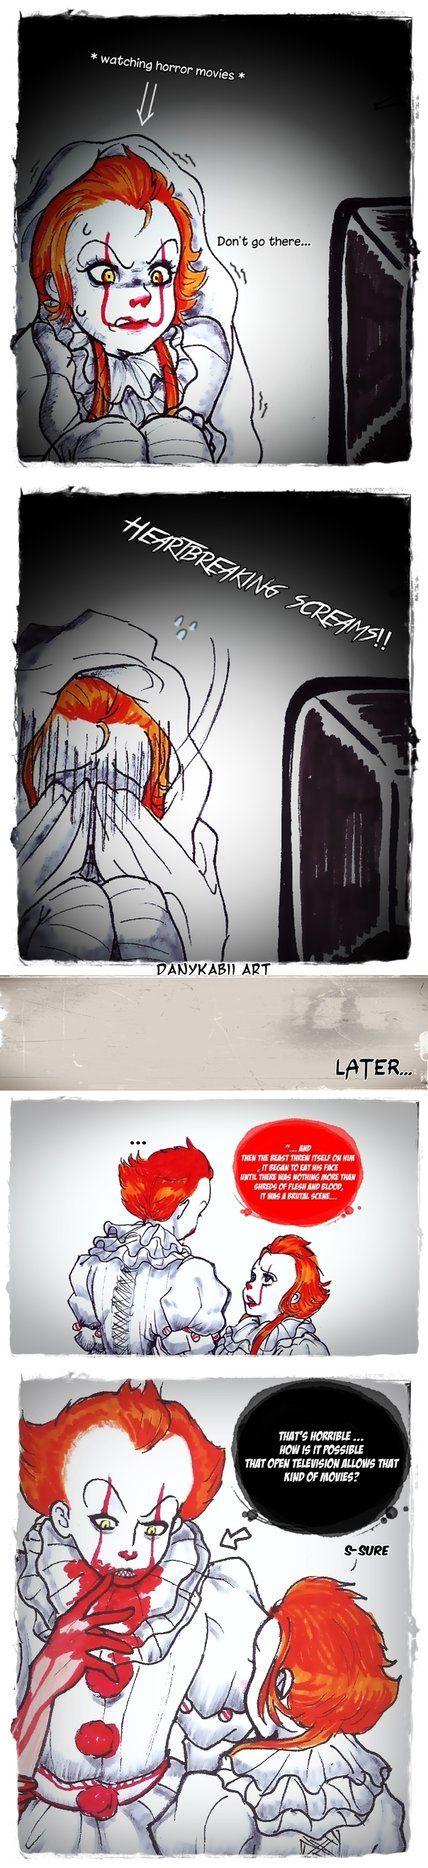 ||Horror experience|| by DanyKabii.deviantart.com on @DeviantArt